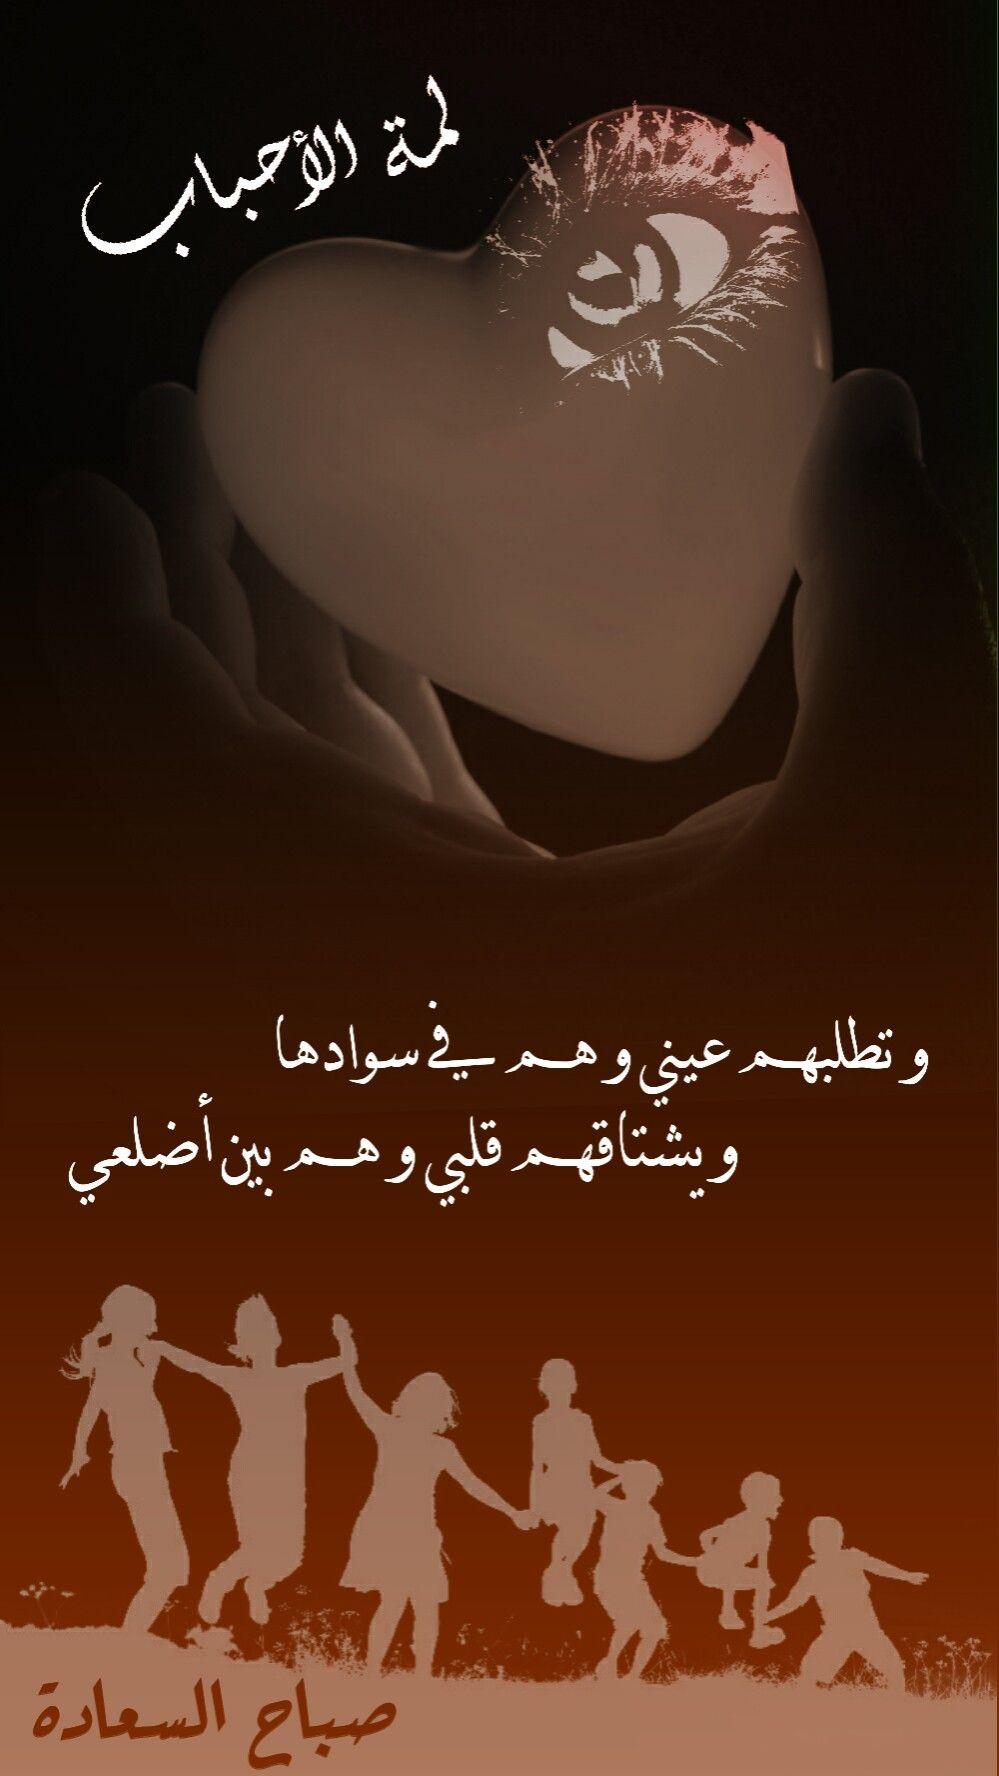 Pin By Ranya Anis On صباحيات و مسائيات Good Morning Arabic Beautiful Arabic Words Good Morning